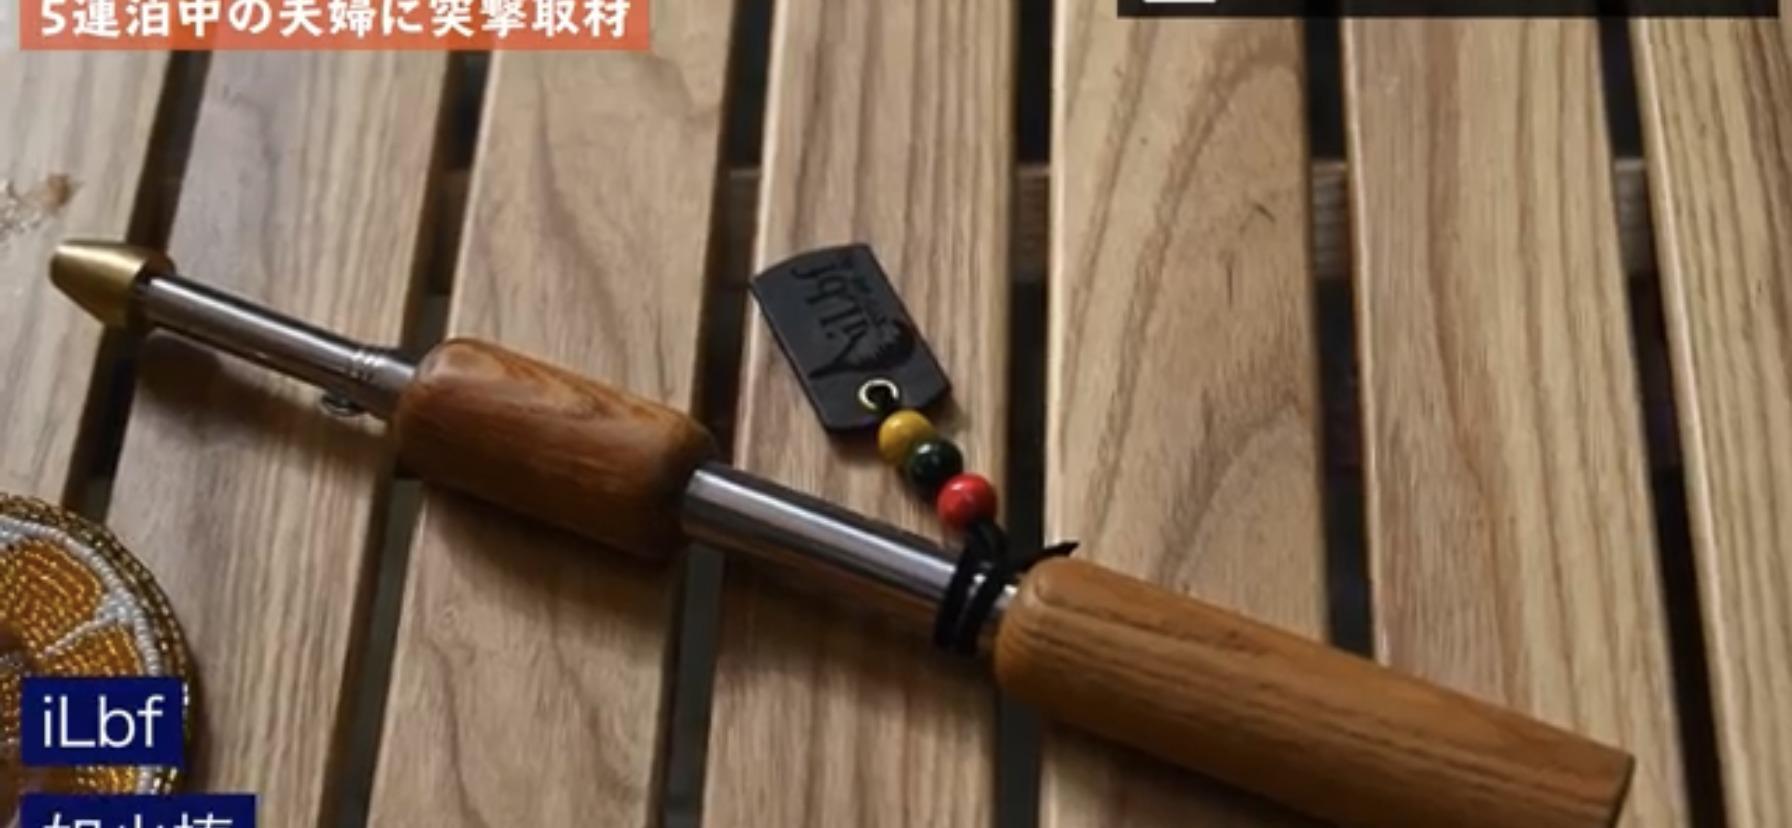 【iLbf】ファイヤーブラスター 火吹き棒